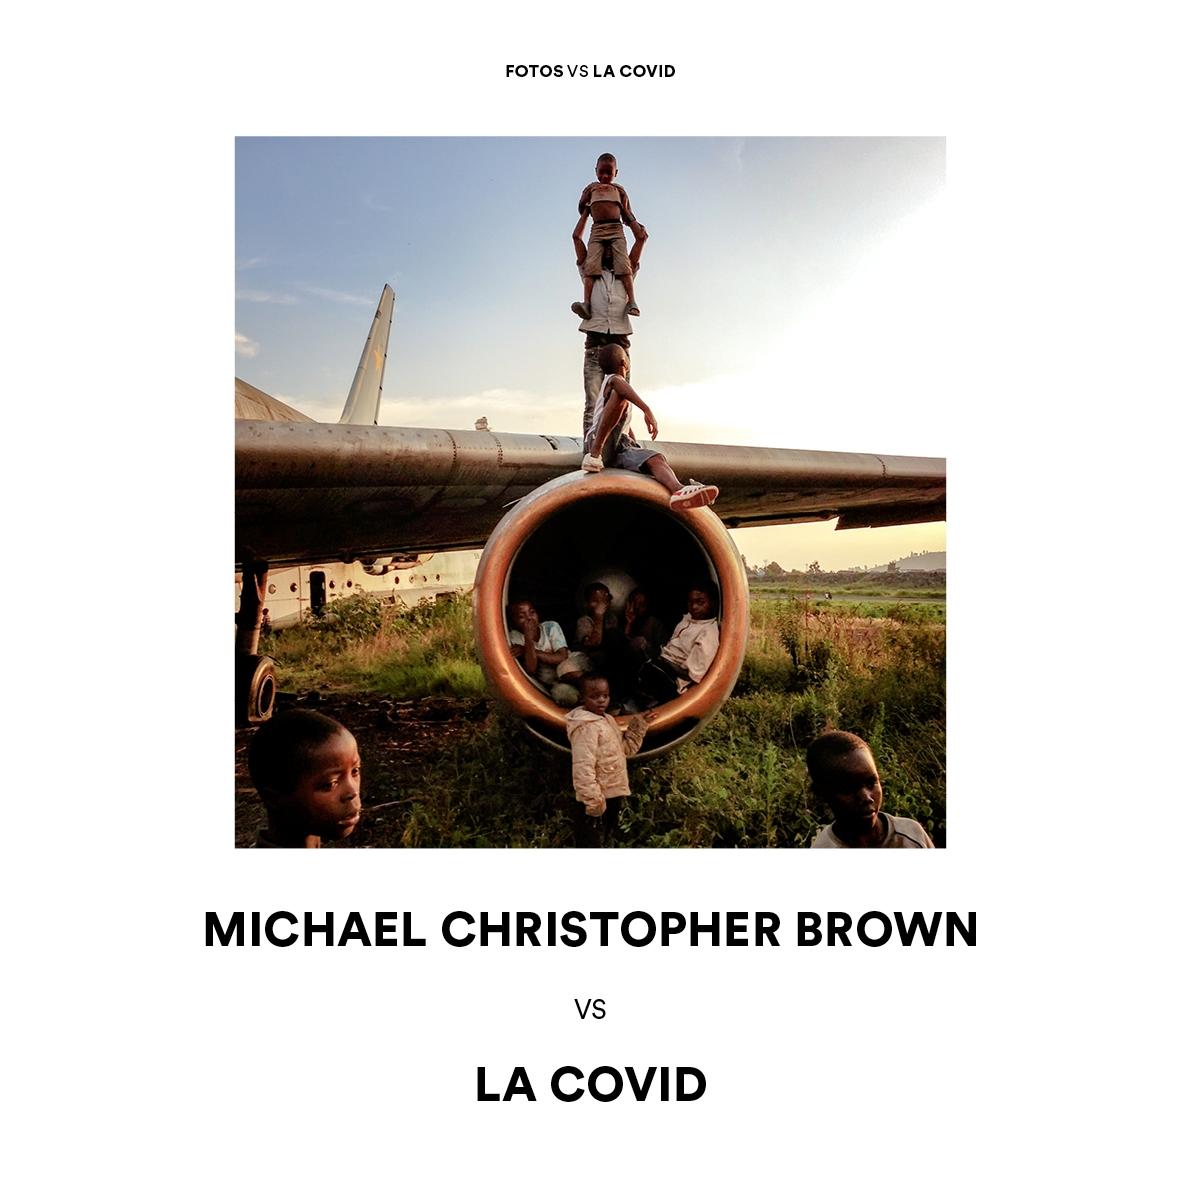 Michael Christopher Brown POST